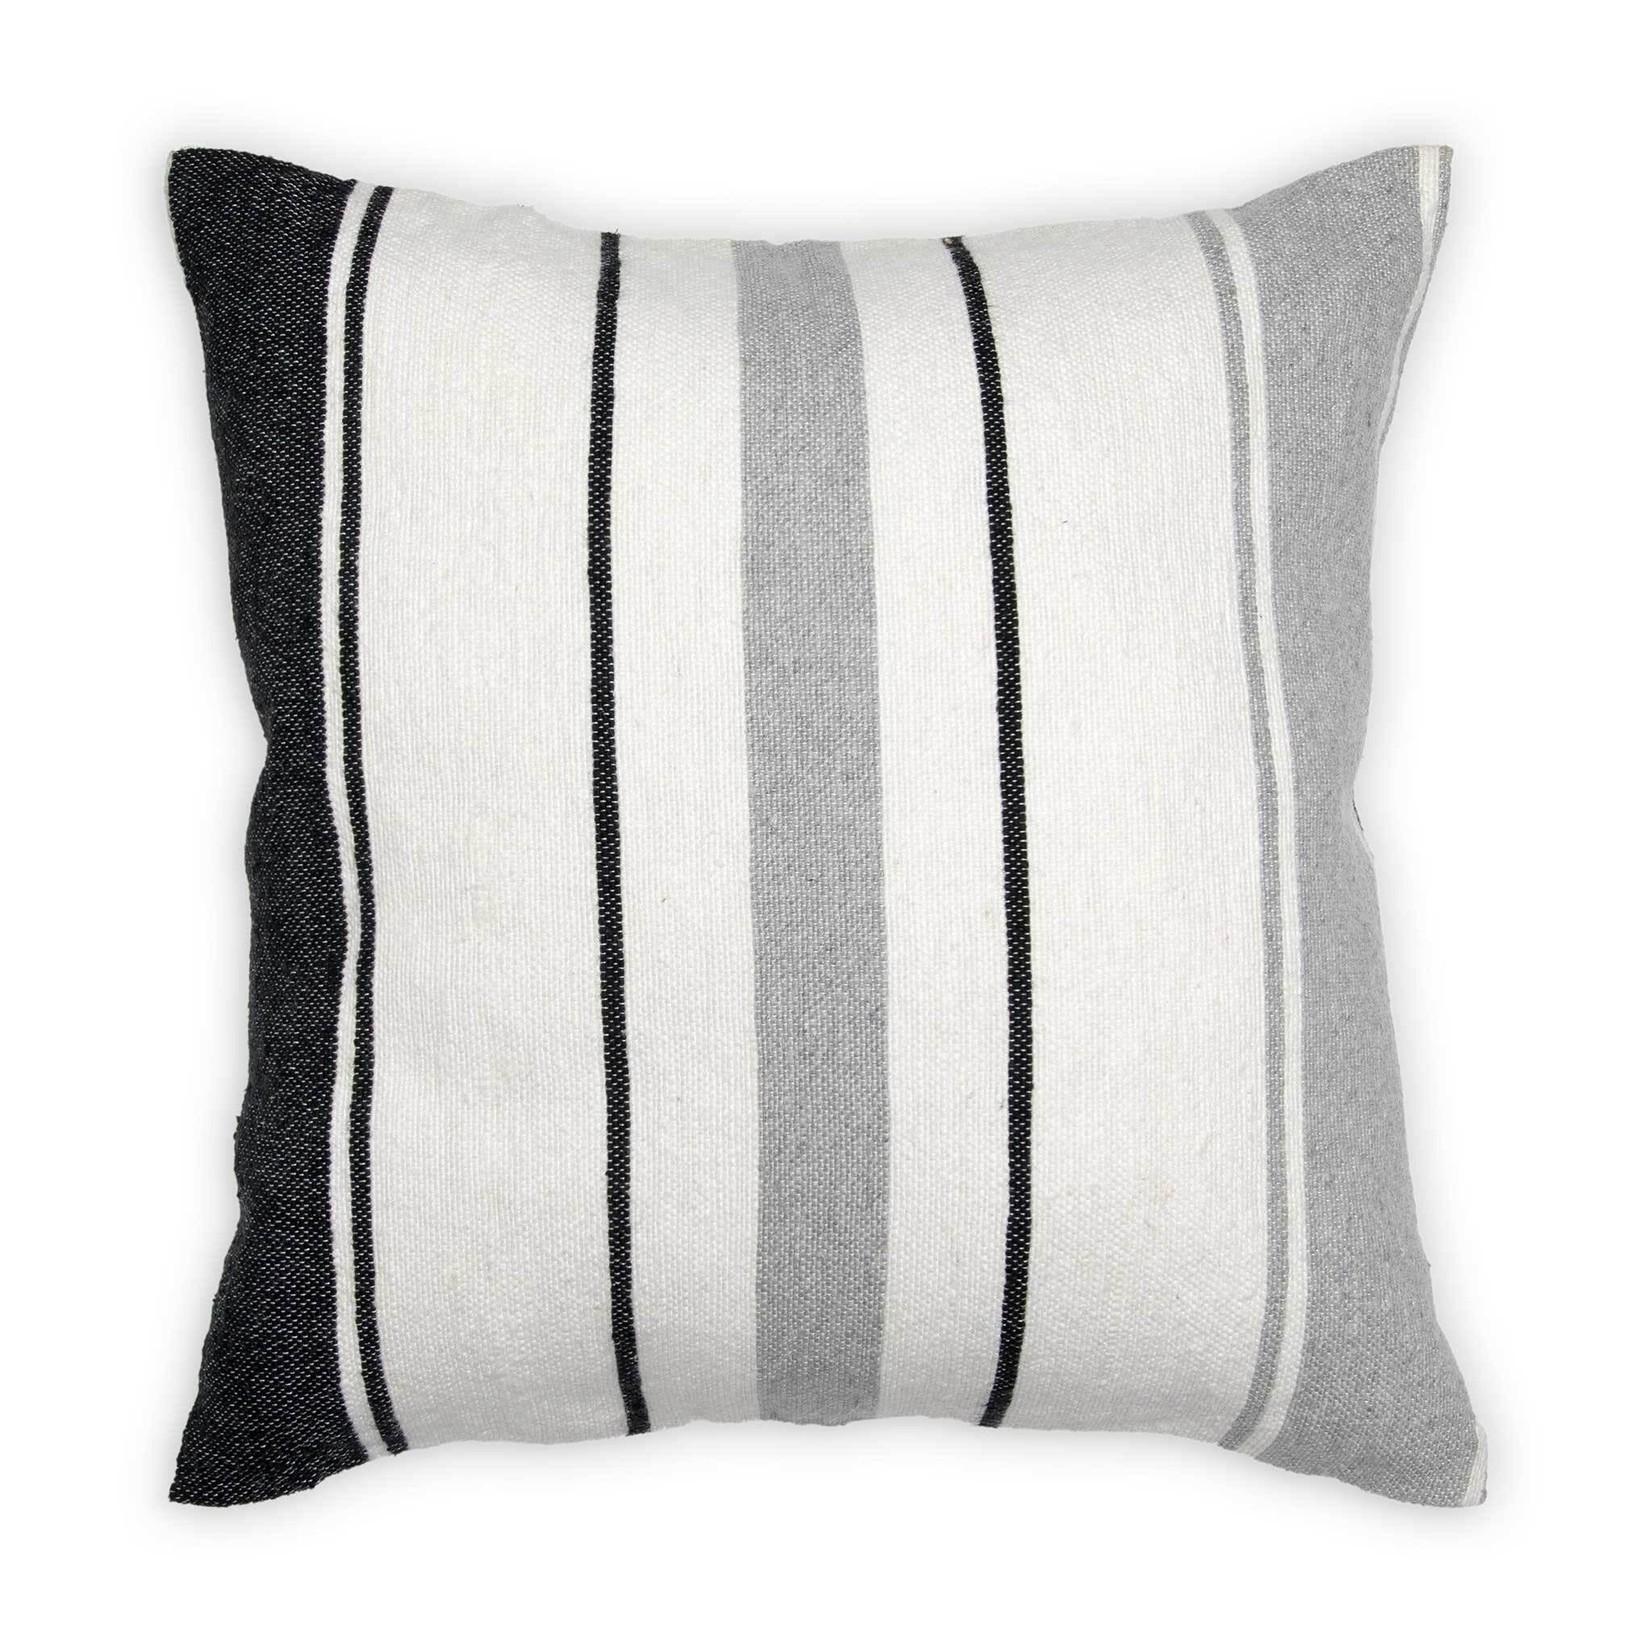 "Moroccan Pom Pom Pillow - 18""x18"" Multi Stripe"